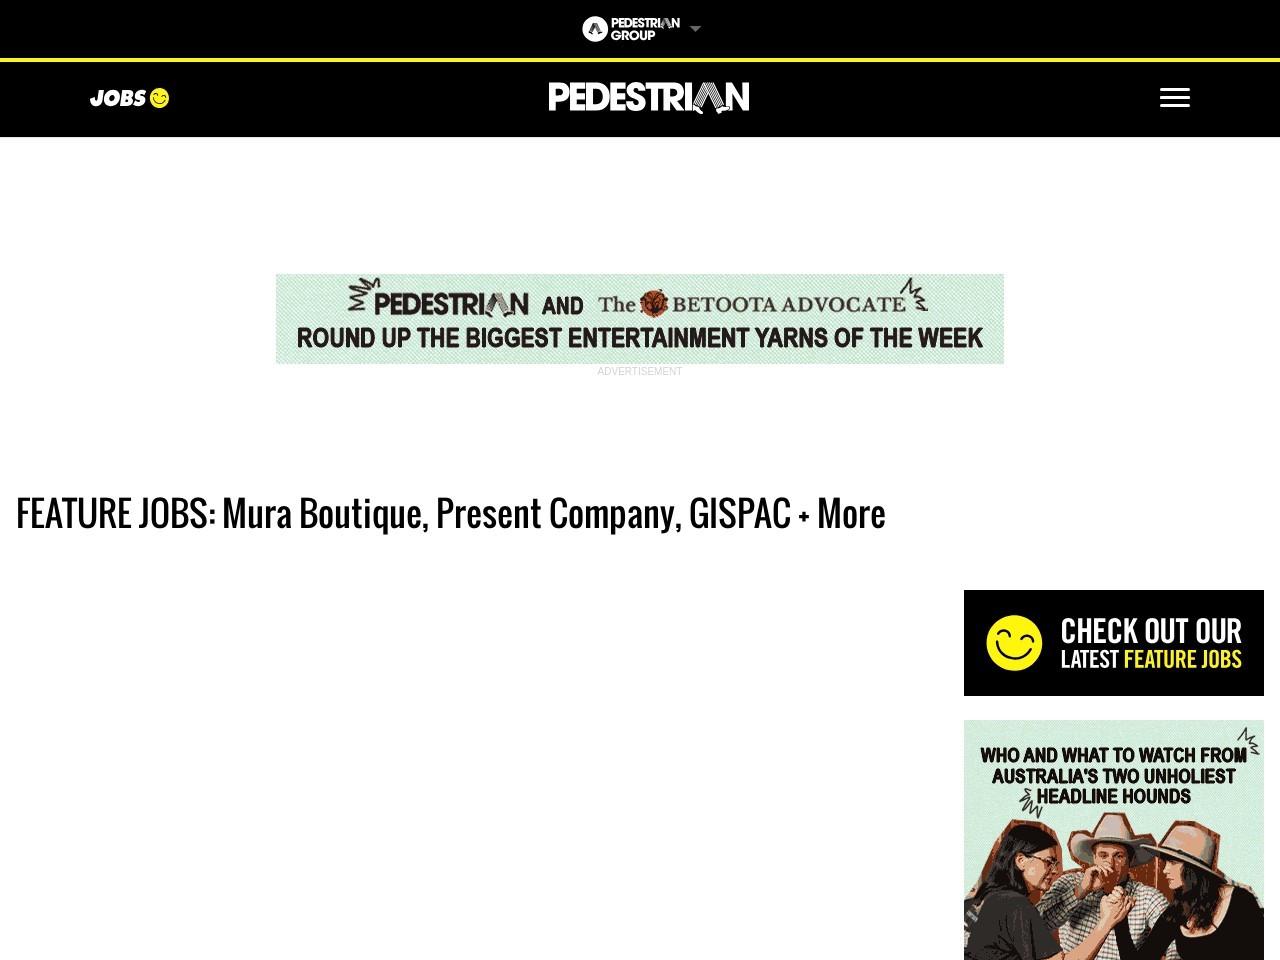 FEATURE JOBS: Mura Boutique, Present Firm, GISPAC + More